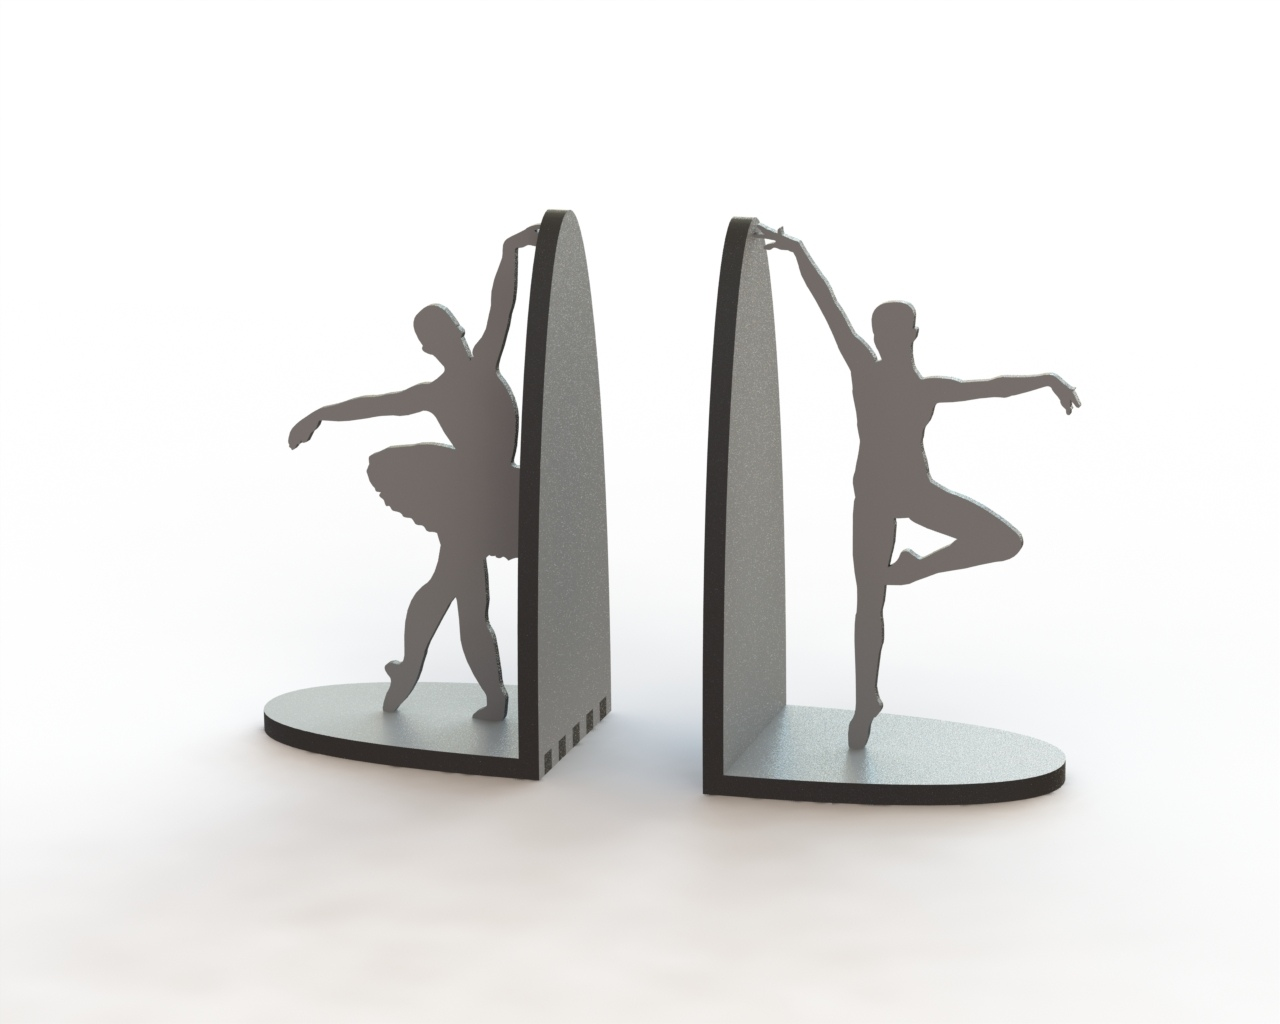 Laser Cut Ballerina Pair Book Supports Free CDR Vectors Art